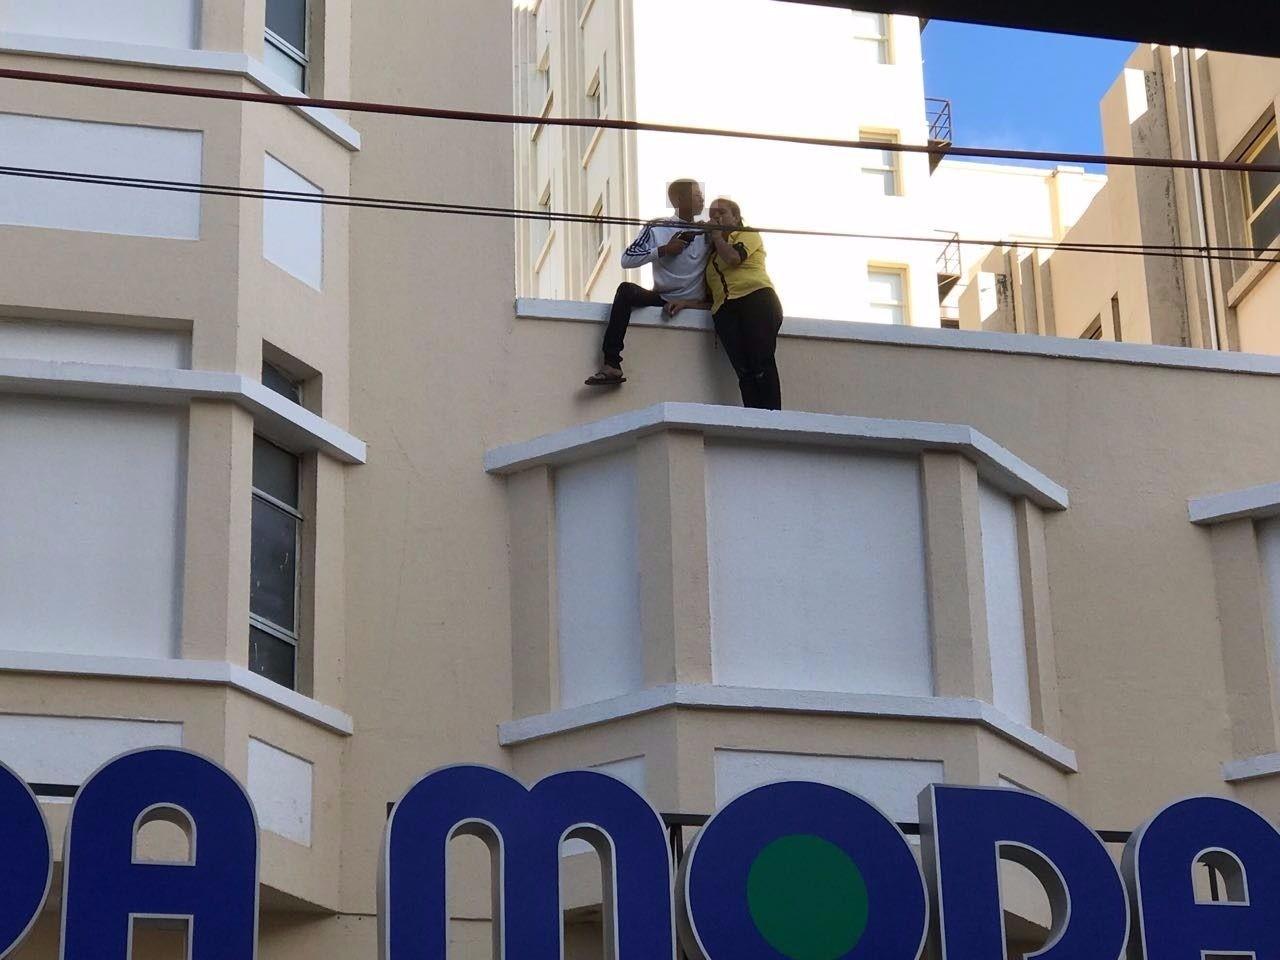 Assalto com refém no Centro de Fortaleza gera tumulto e correria